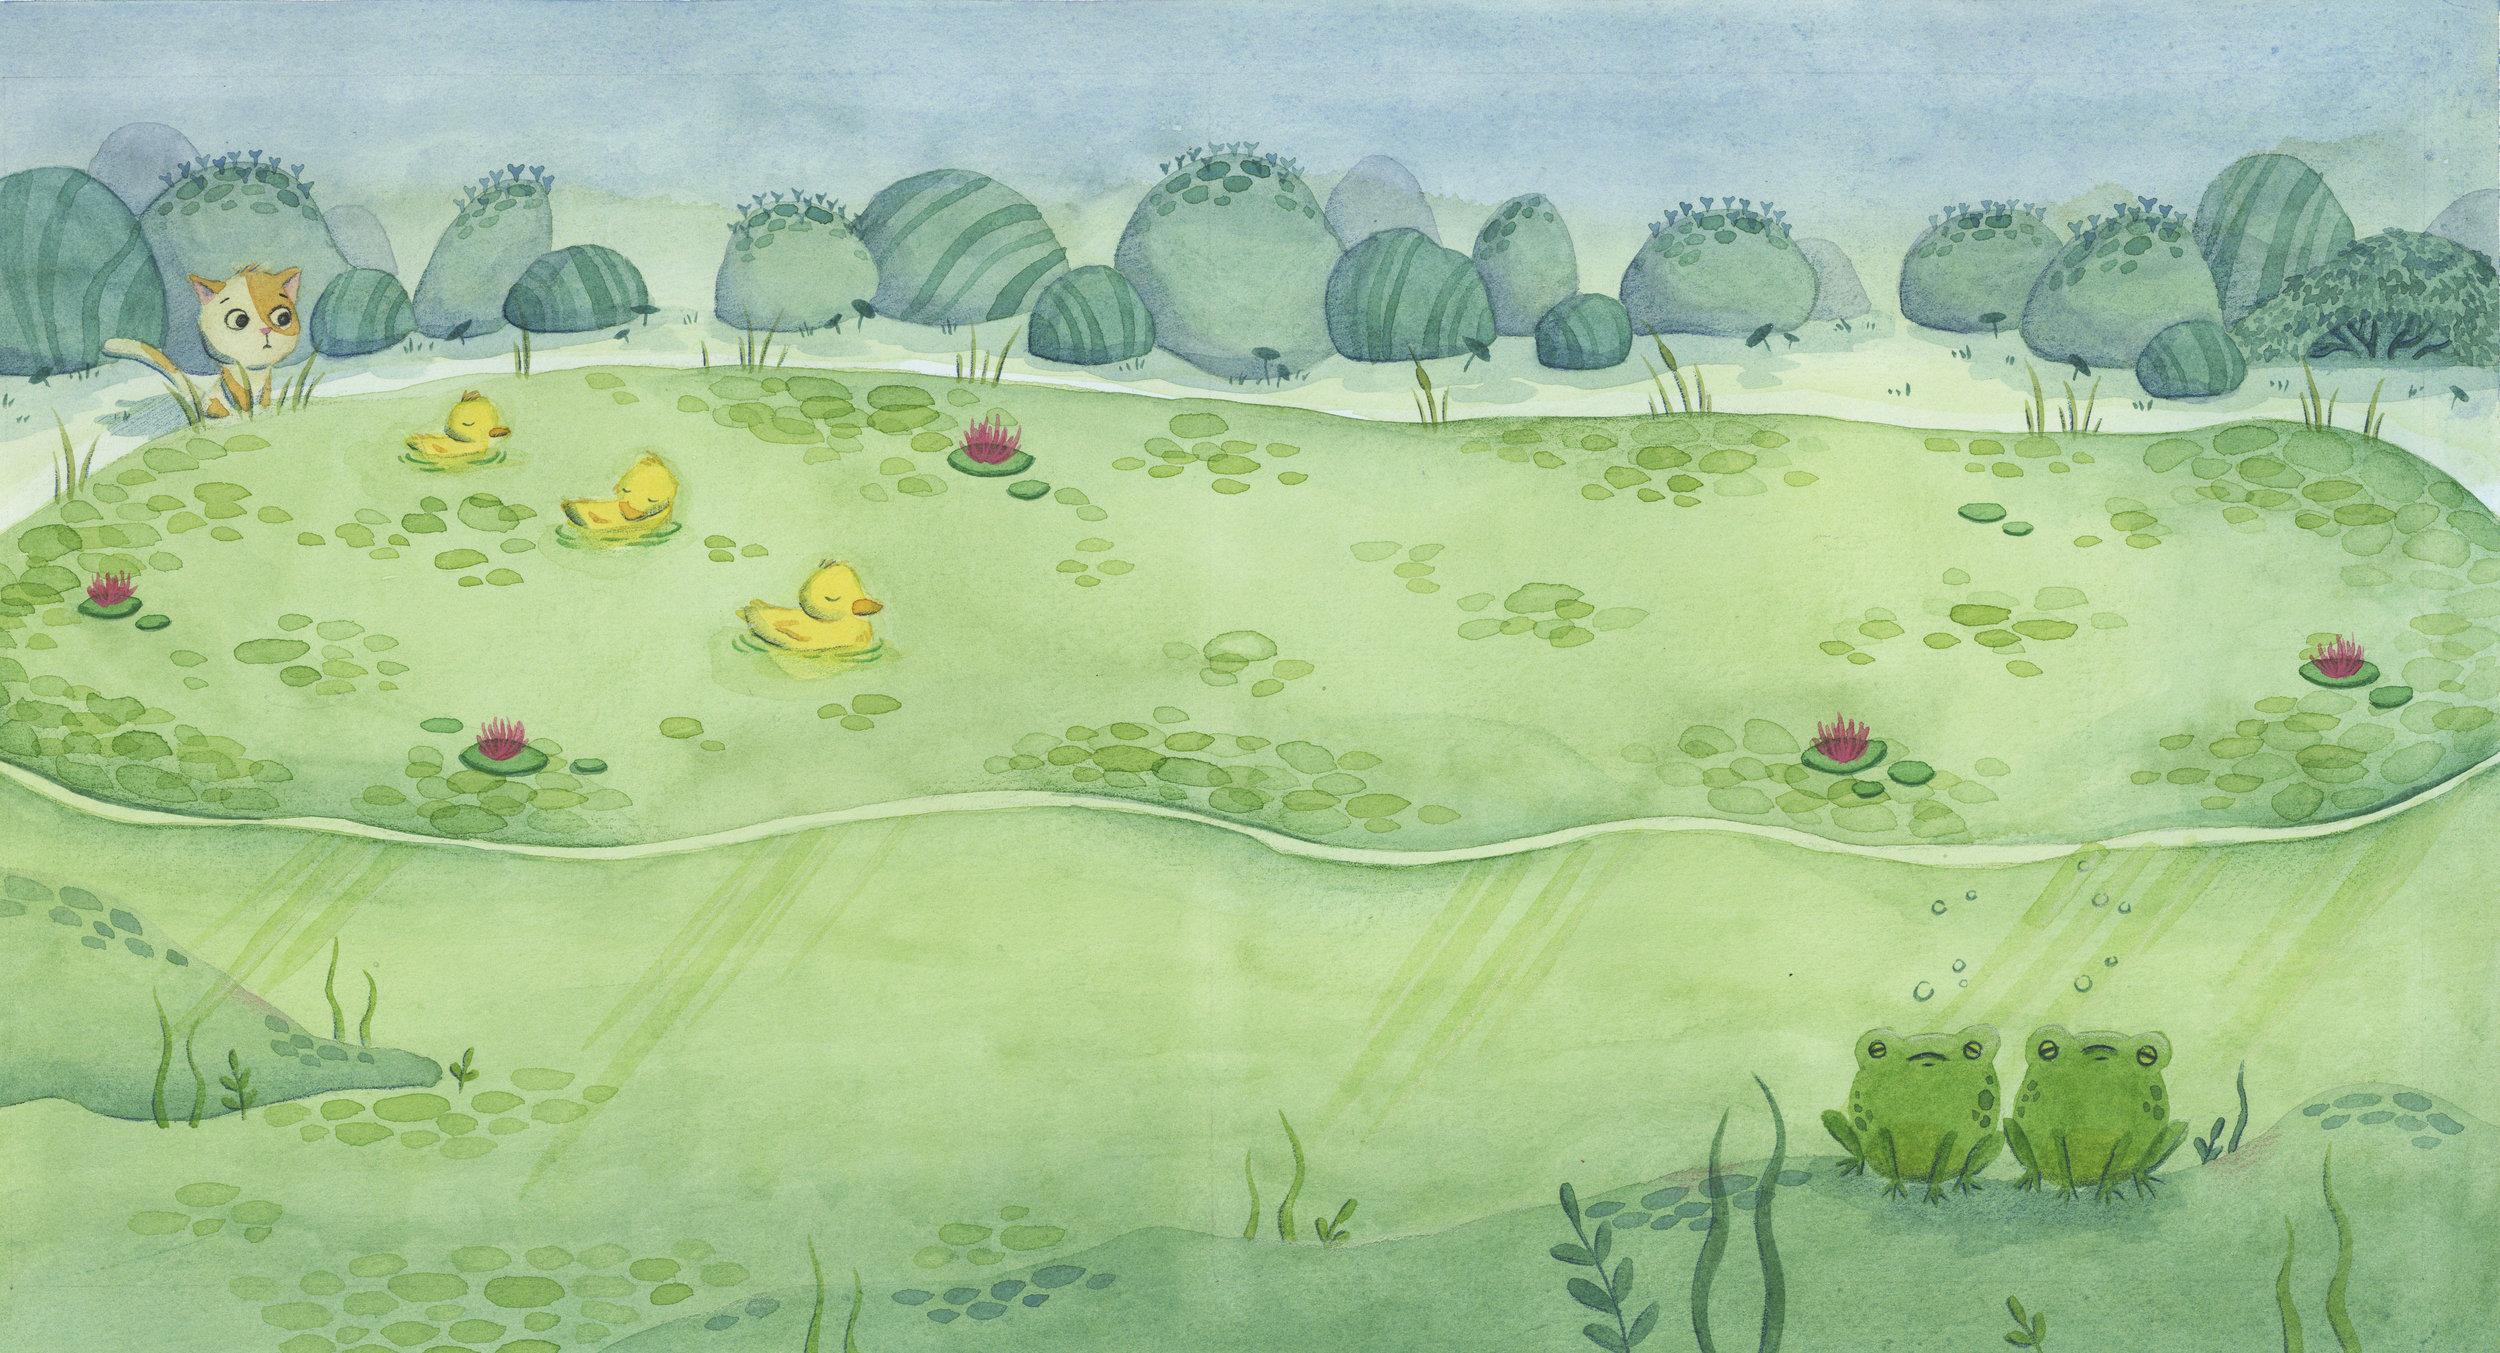 Children Illustration Pond Spread.jpg